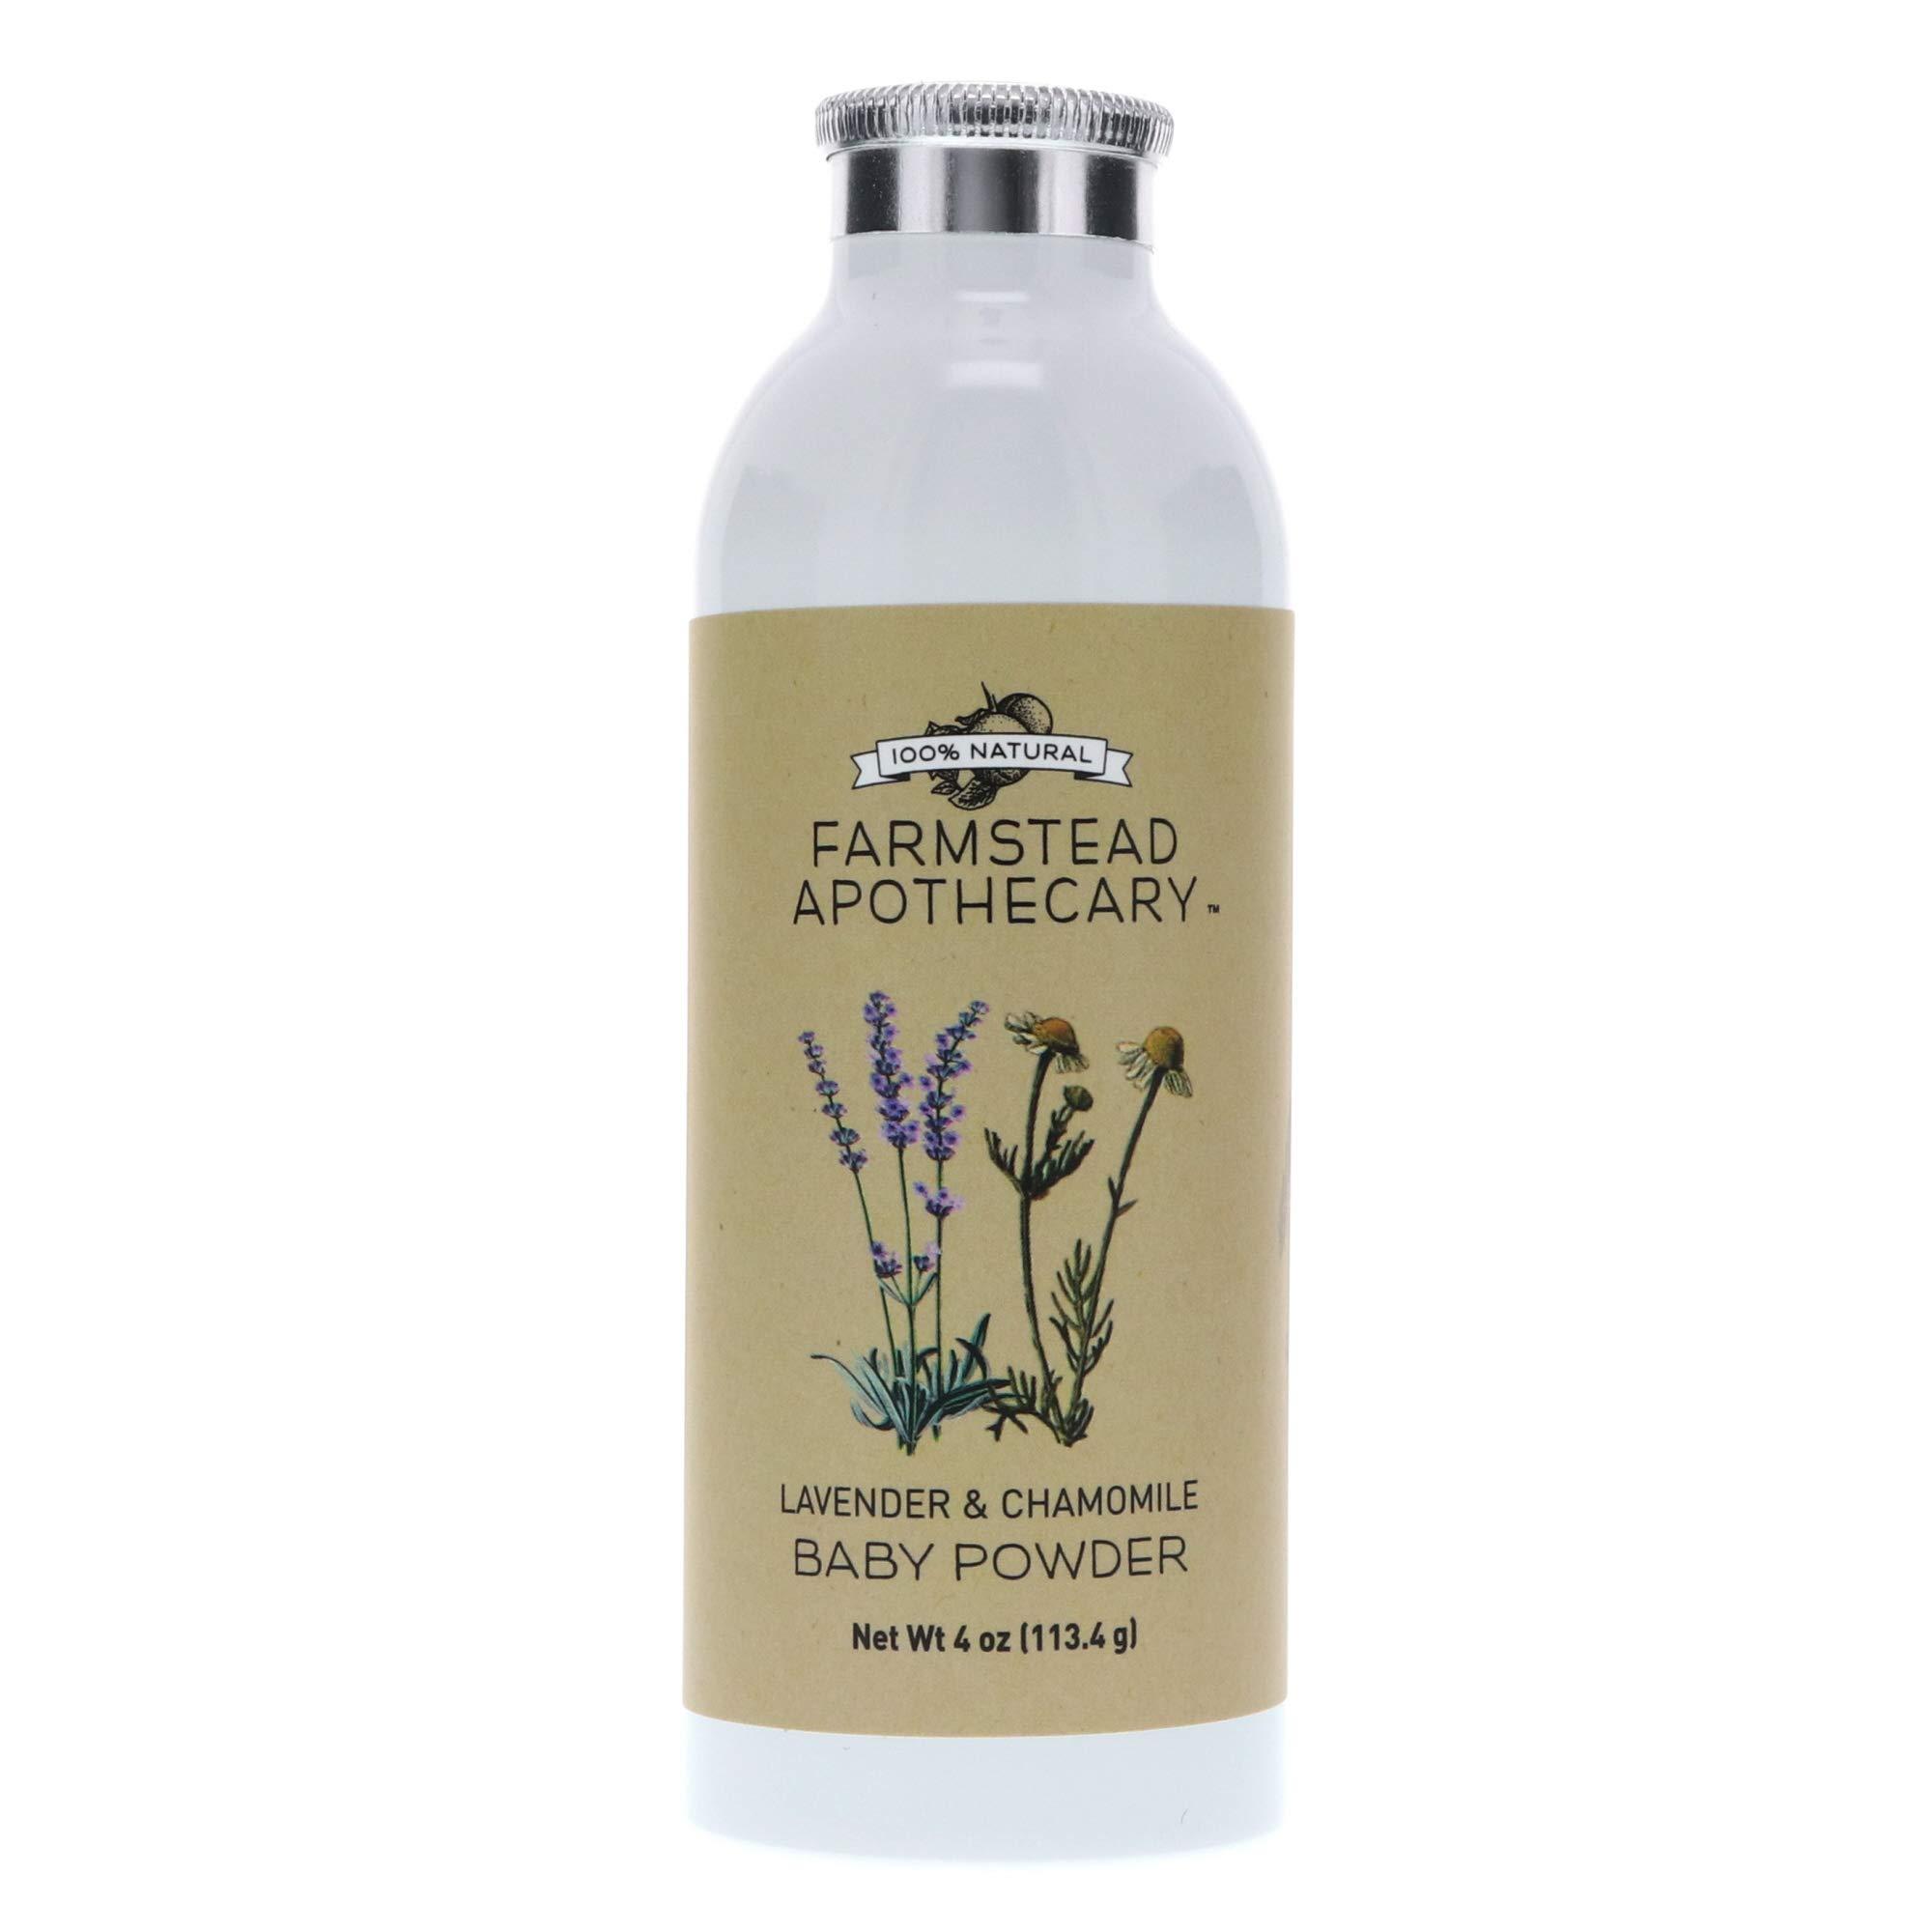 Farmstead Apothecary 100% Natural Baby Powder (Talc-Free) with Organic Tapioca Starch, Organic Chamomile Flowers, Organic Calendula Flowers, Lavender & Chamomile 4 oz by Farmstead Apothecary